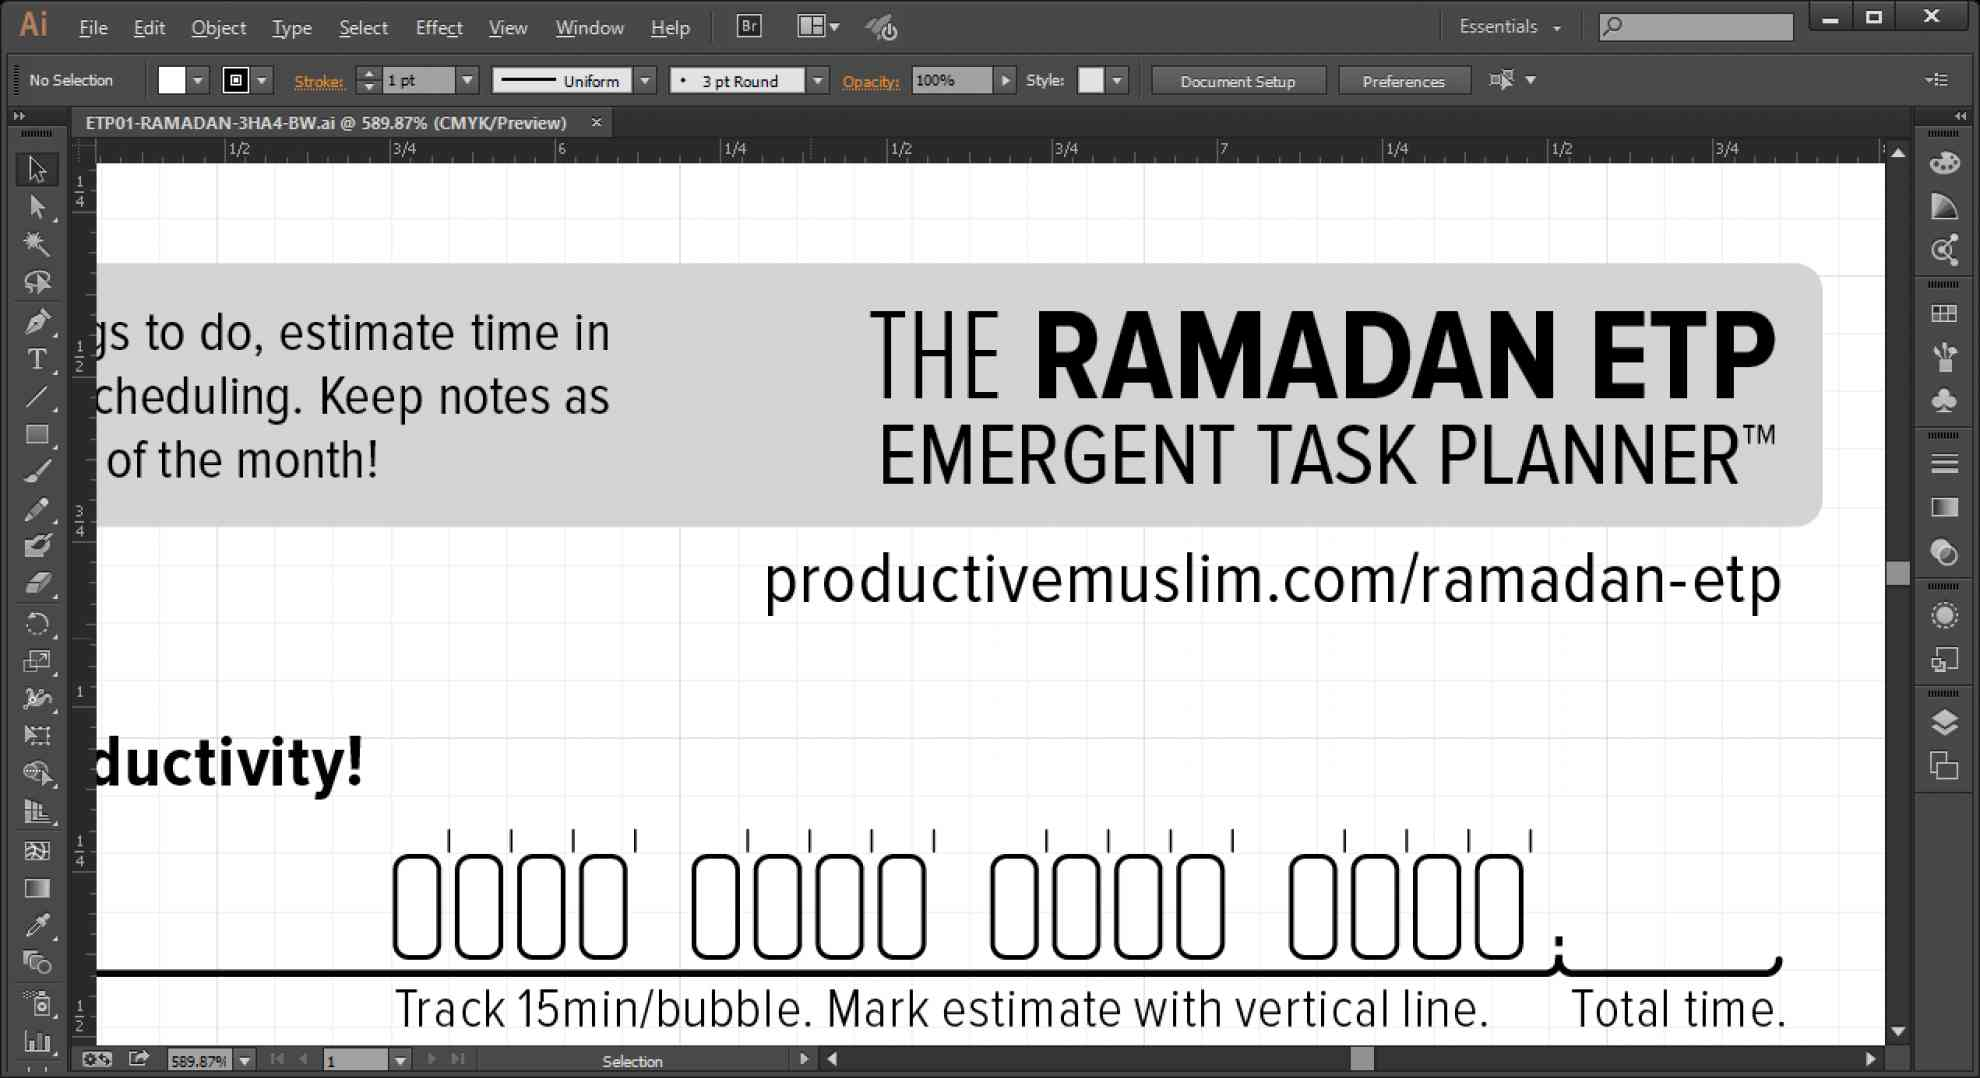 TheRamadanETPincooperationwithProductiveMuslim